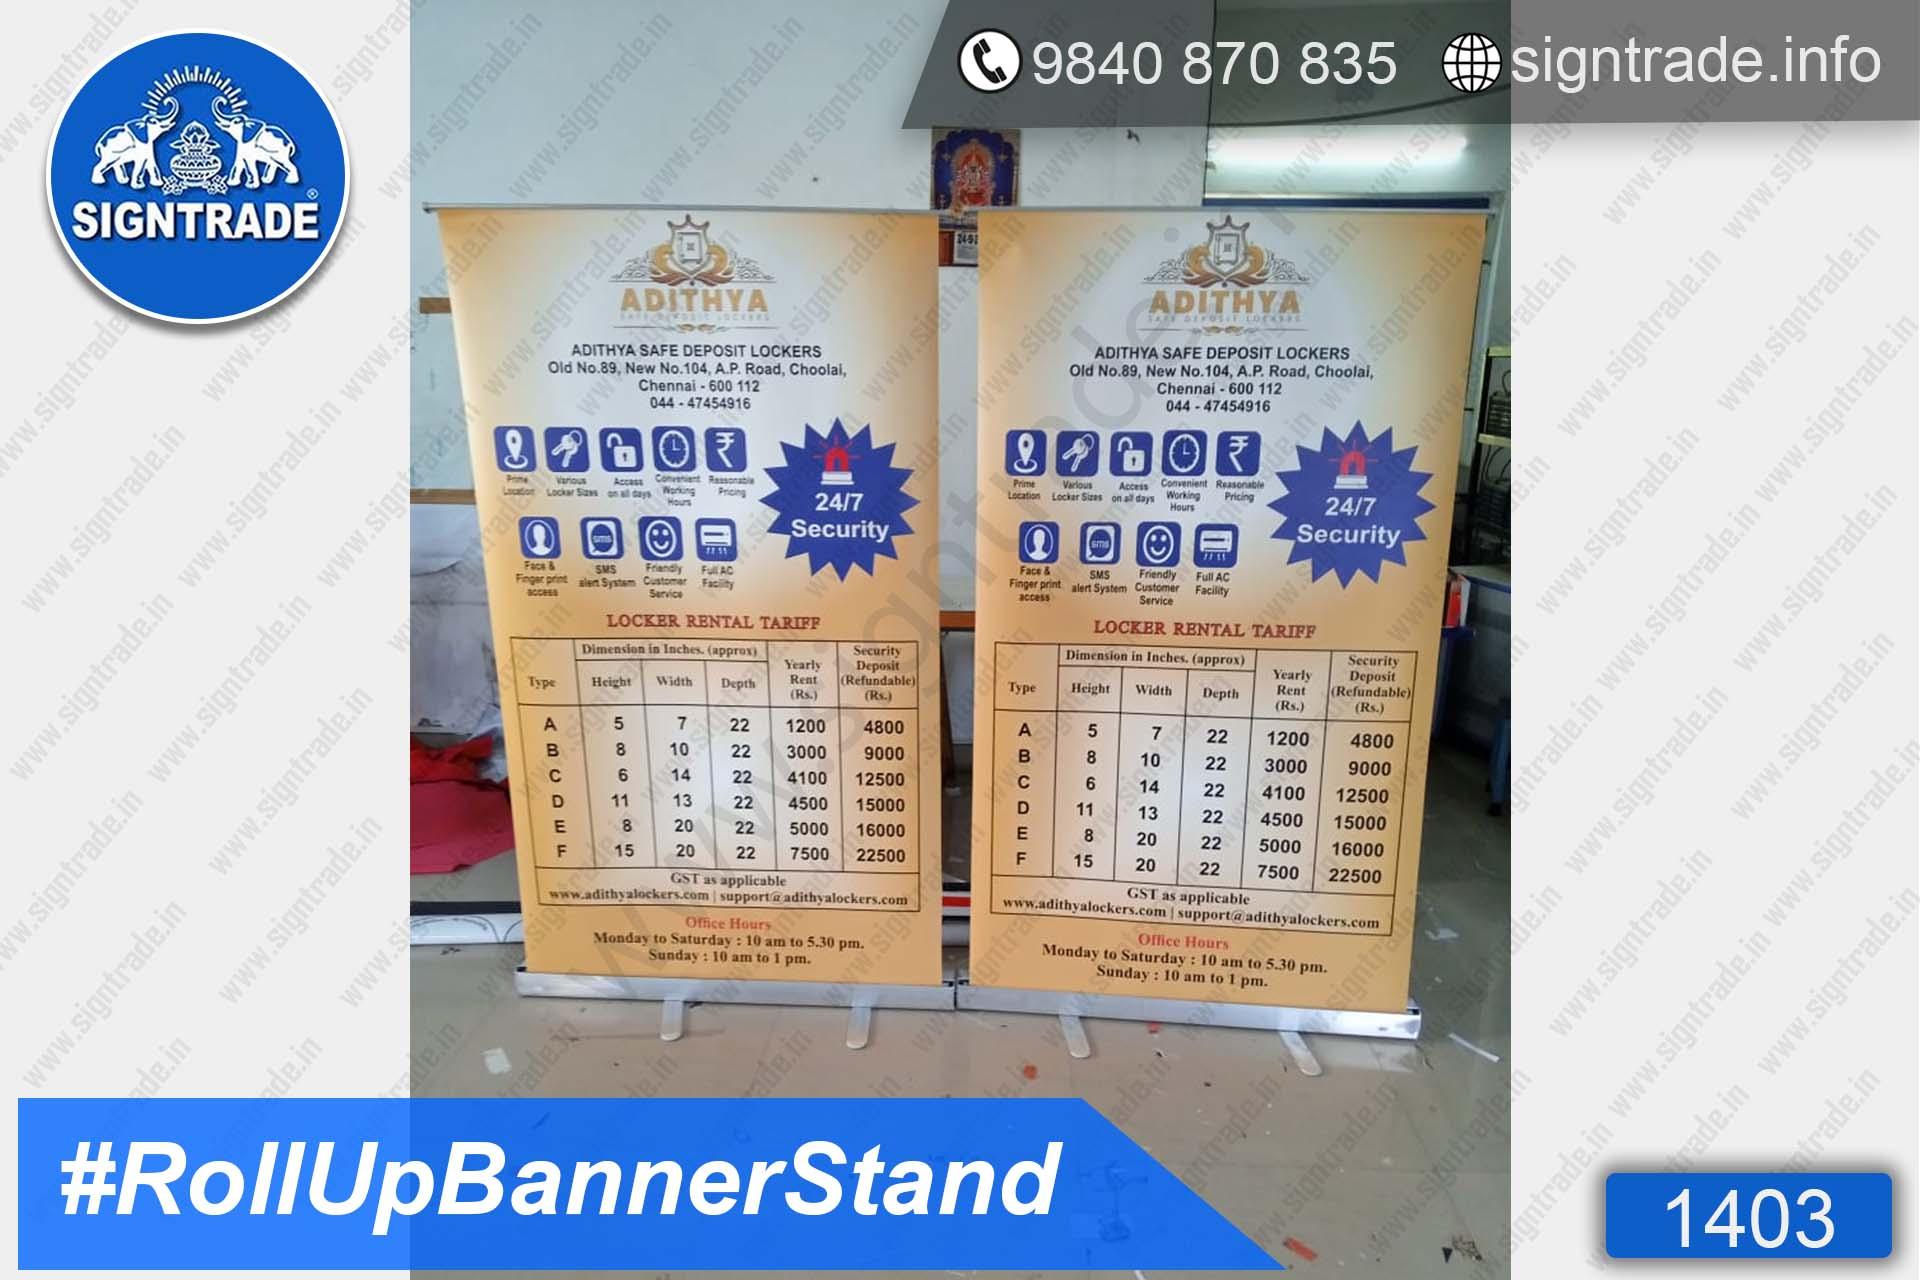 Adithya Safe Deposit Lockers - 1403, Retractable Banner, Roll Up Banner Stand, Banner Stand, Roll Up Banner, Standee, Promotional Standee, Promotional Roll Up Standee, Promo Standee